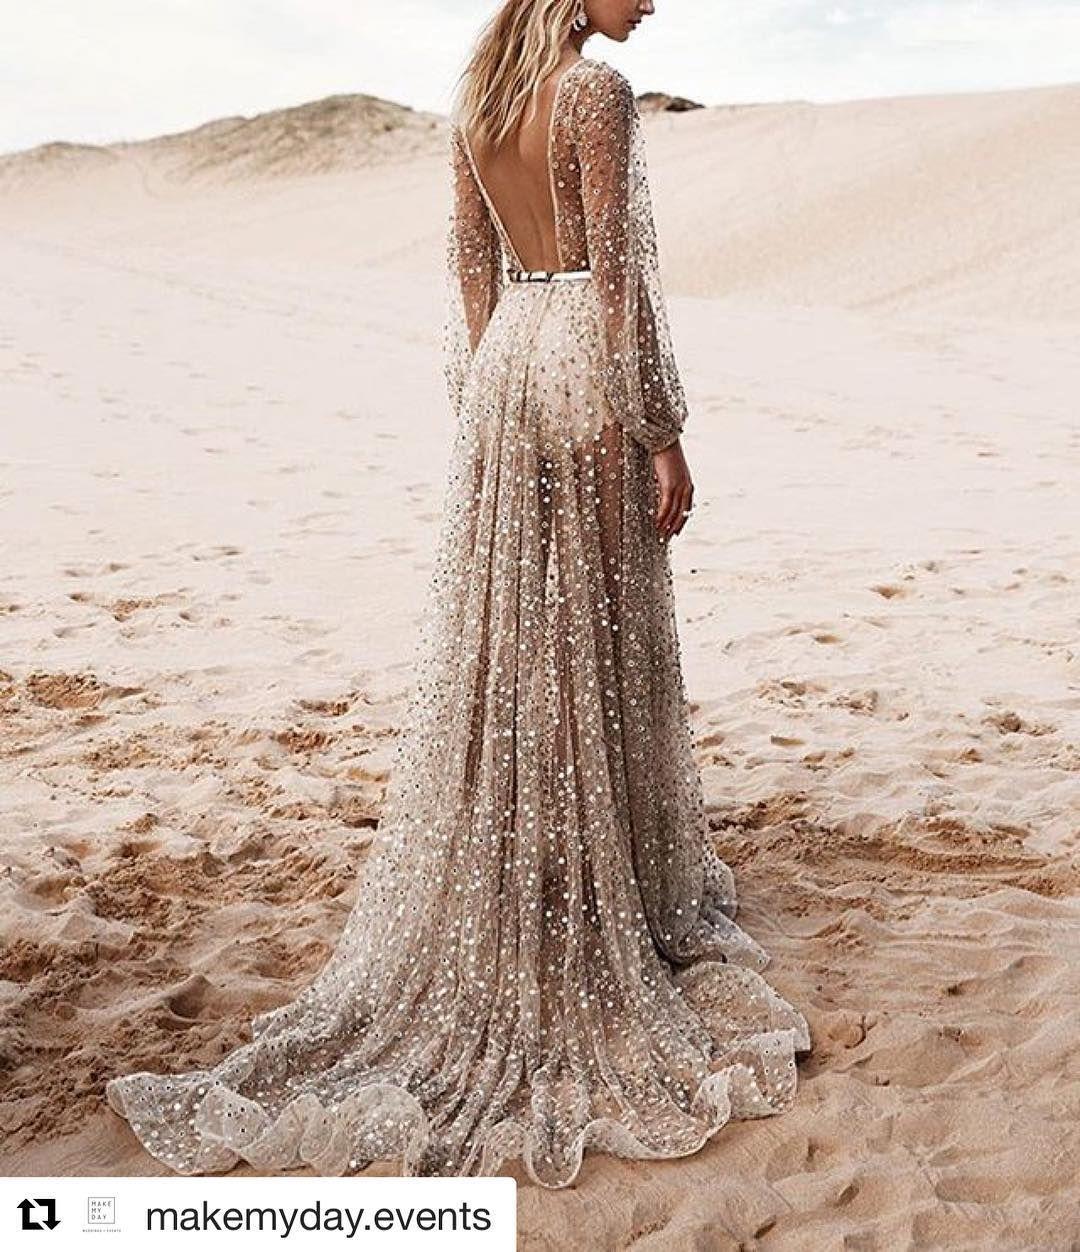 Wow In Love With This Stunning Dress By Onedaybridal Weddingdressgoals Wedding Canberraweddings Canberrabrid Dantel Elbiseler Balo Elbisesi Kadin Modasi